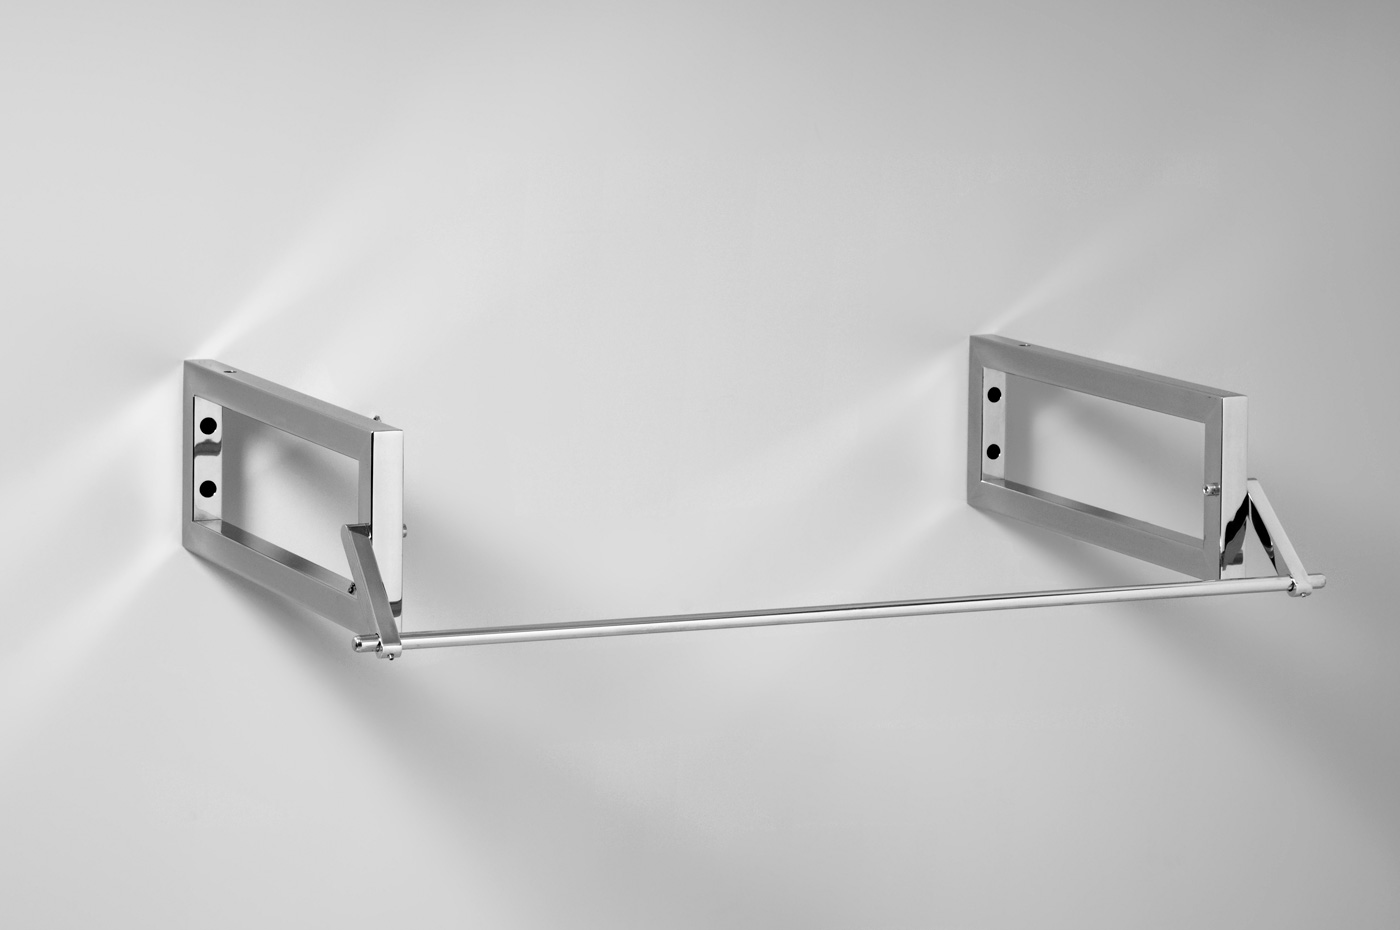 Staffe info salle de bain design ameublement de for Porte serviette fly